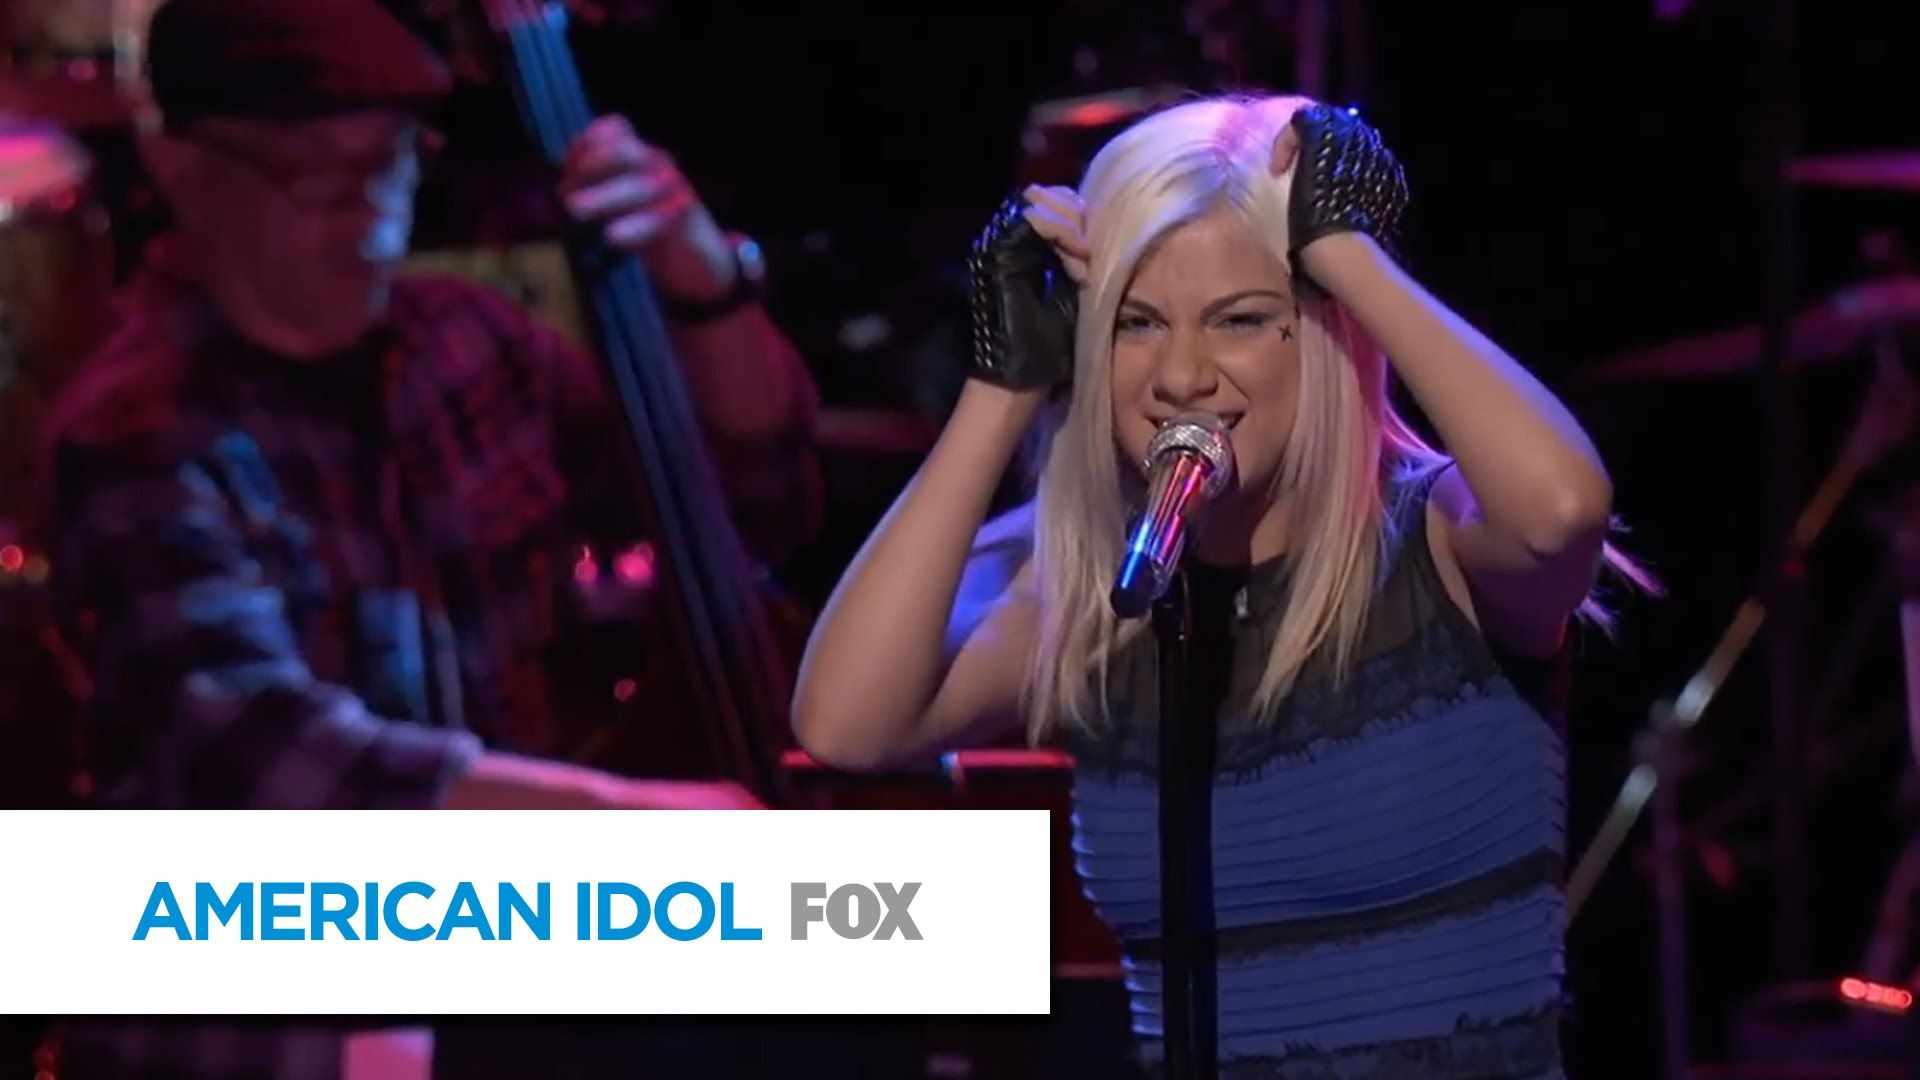 Top 8 Girls Jax American Idol Xiv Ain T No Mountain High Enough American Idol Songs American Idol American Idol Season 14